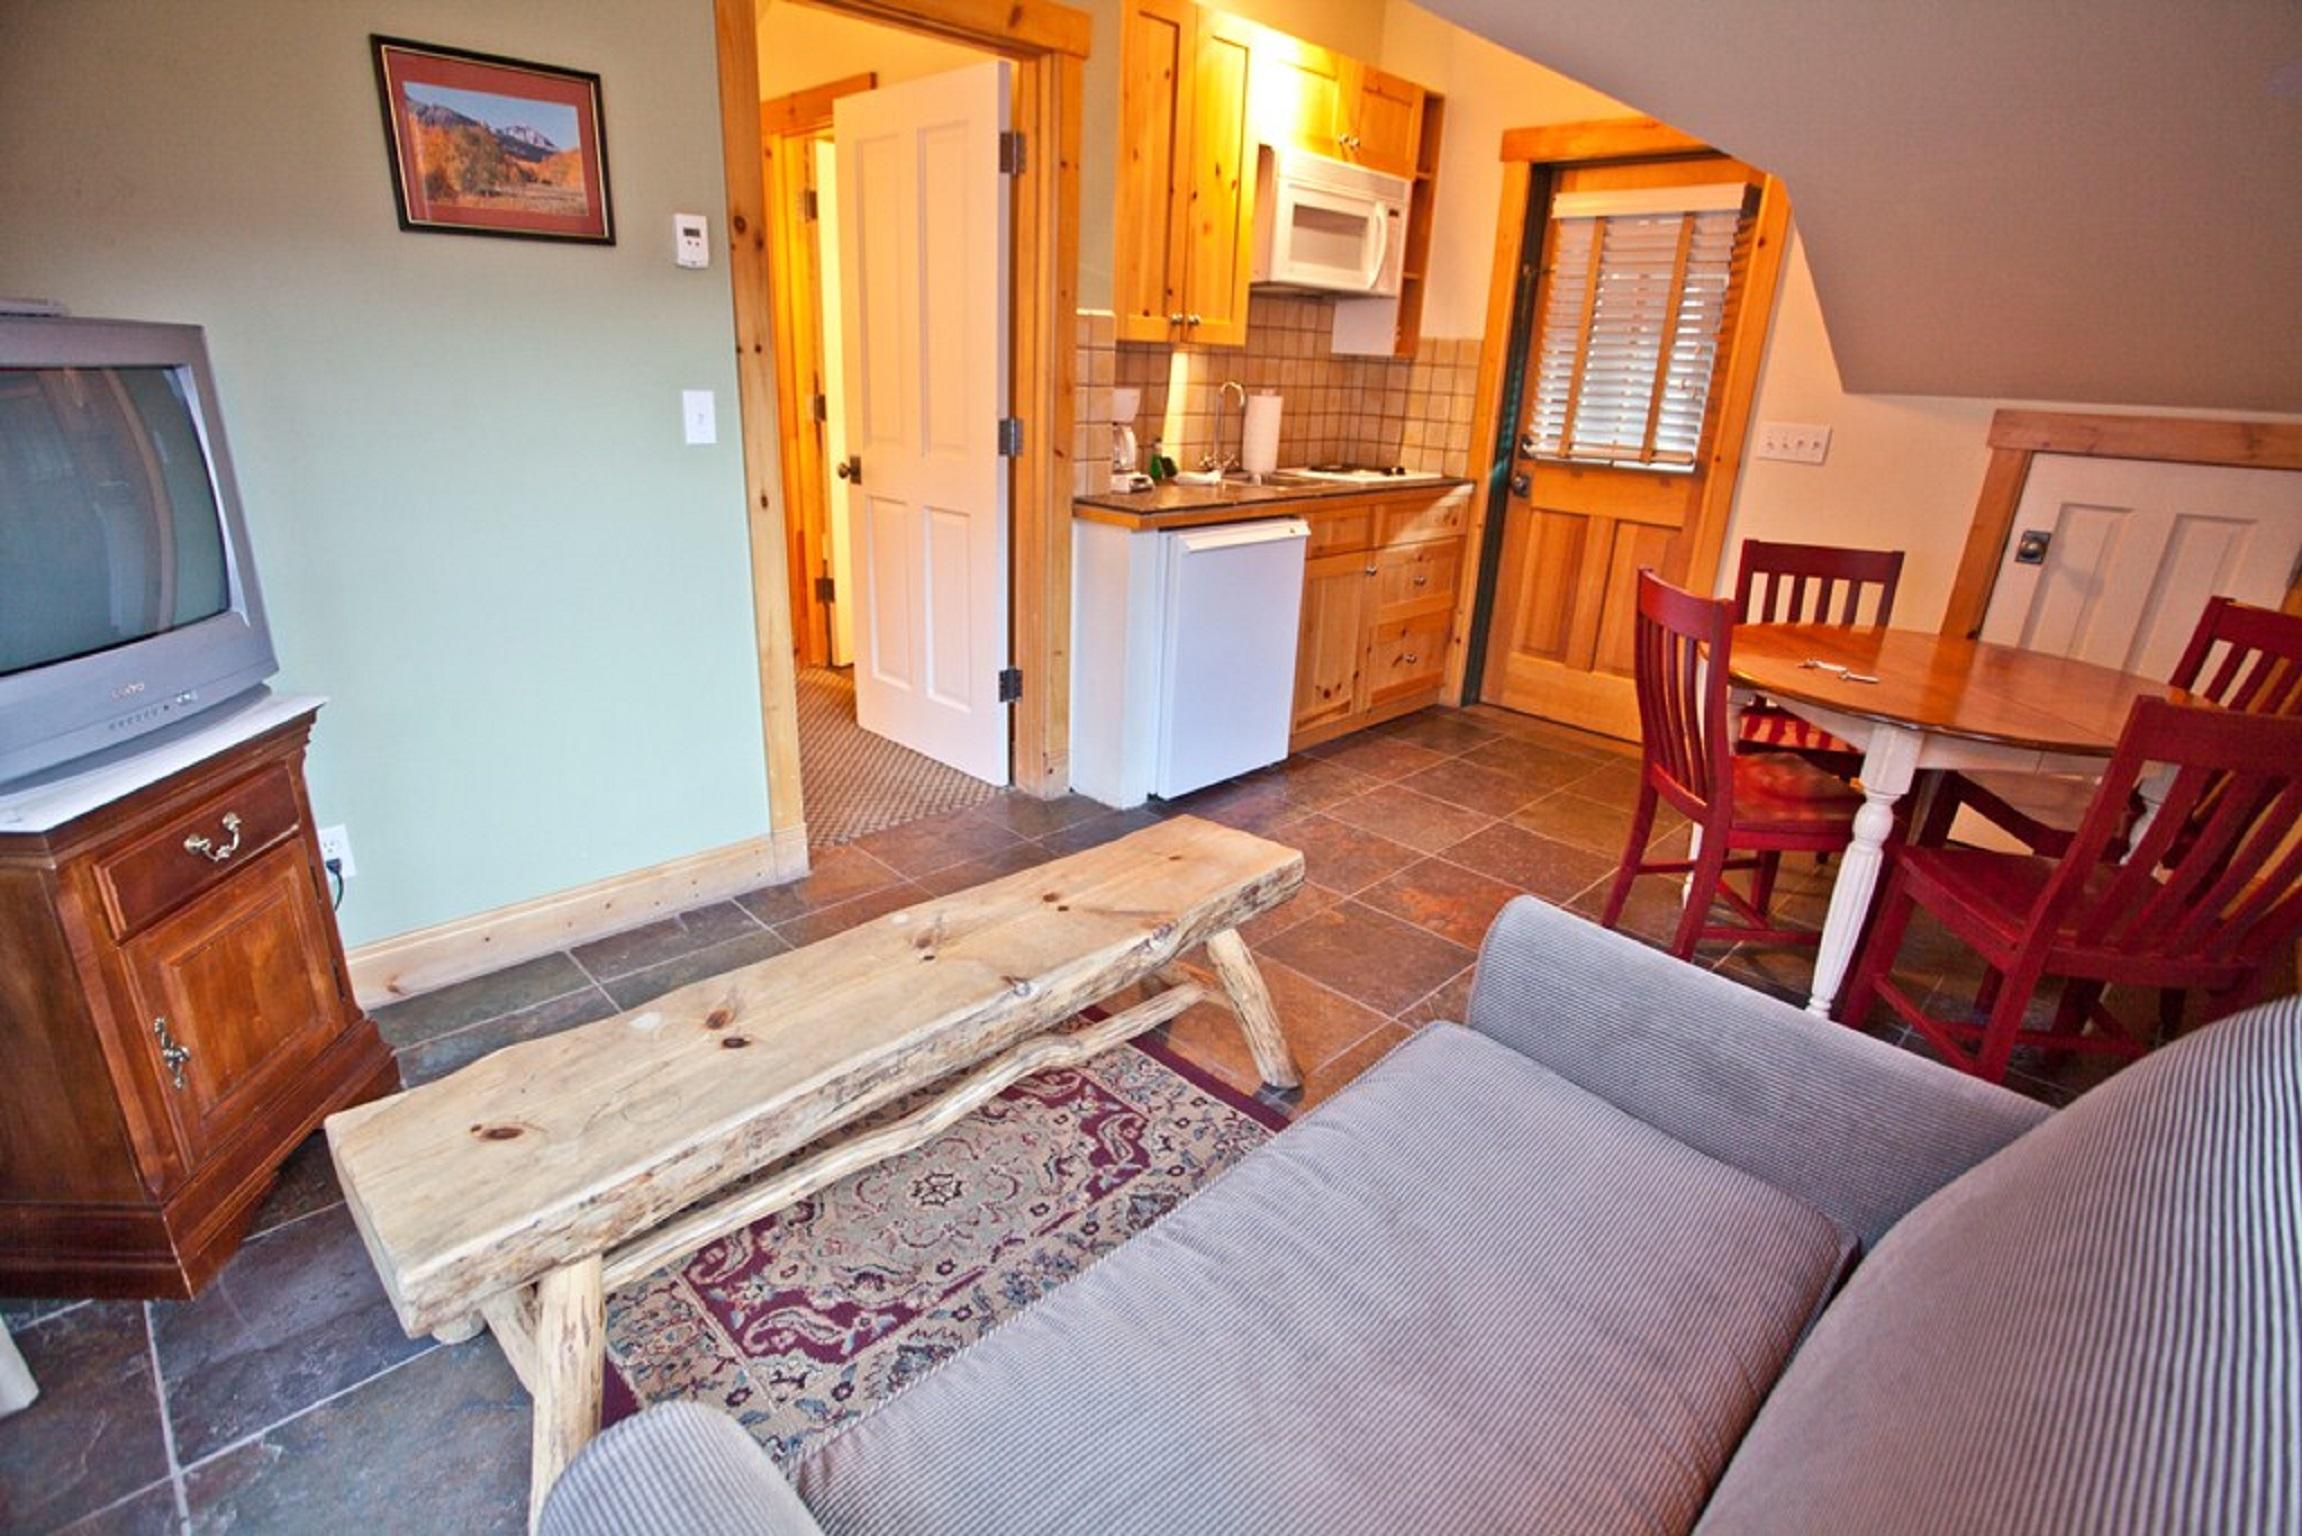 Montana Placer Inn, Unit 6 - Living Area, Small Deck